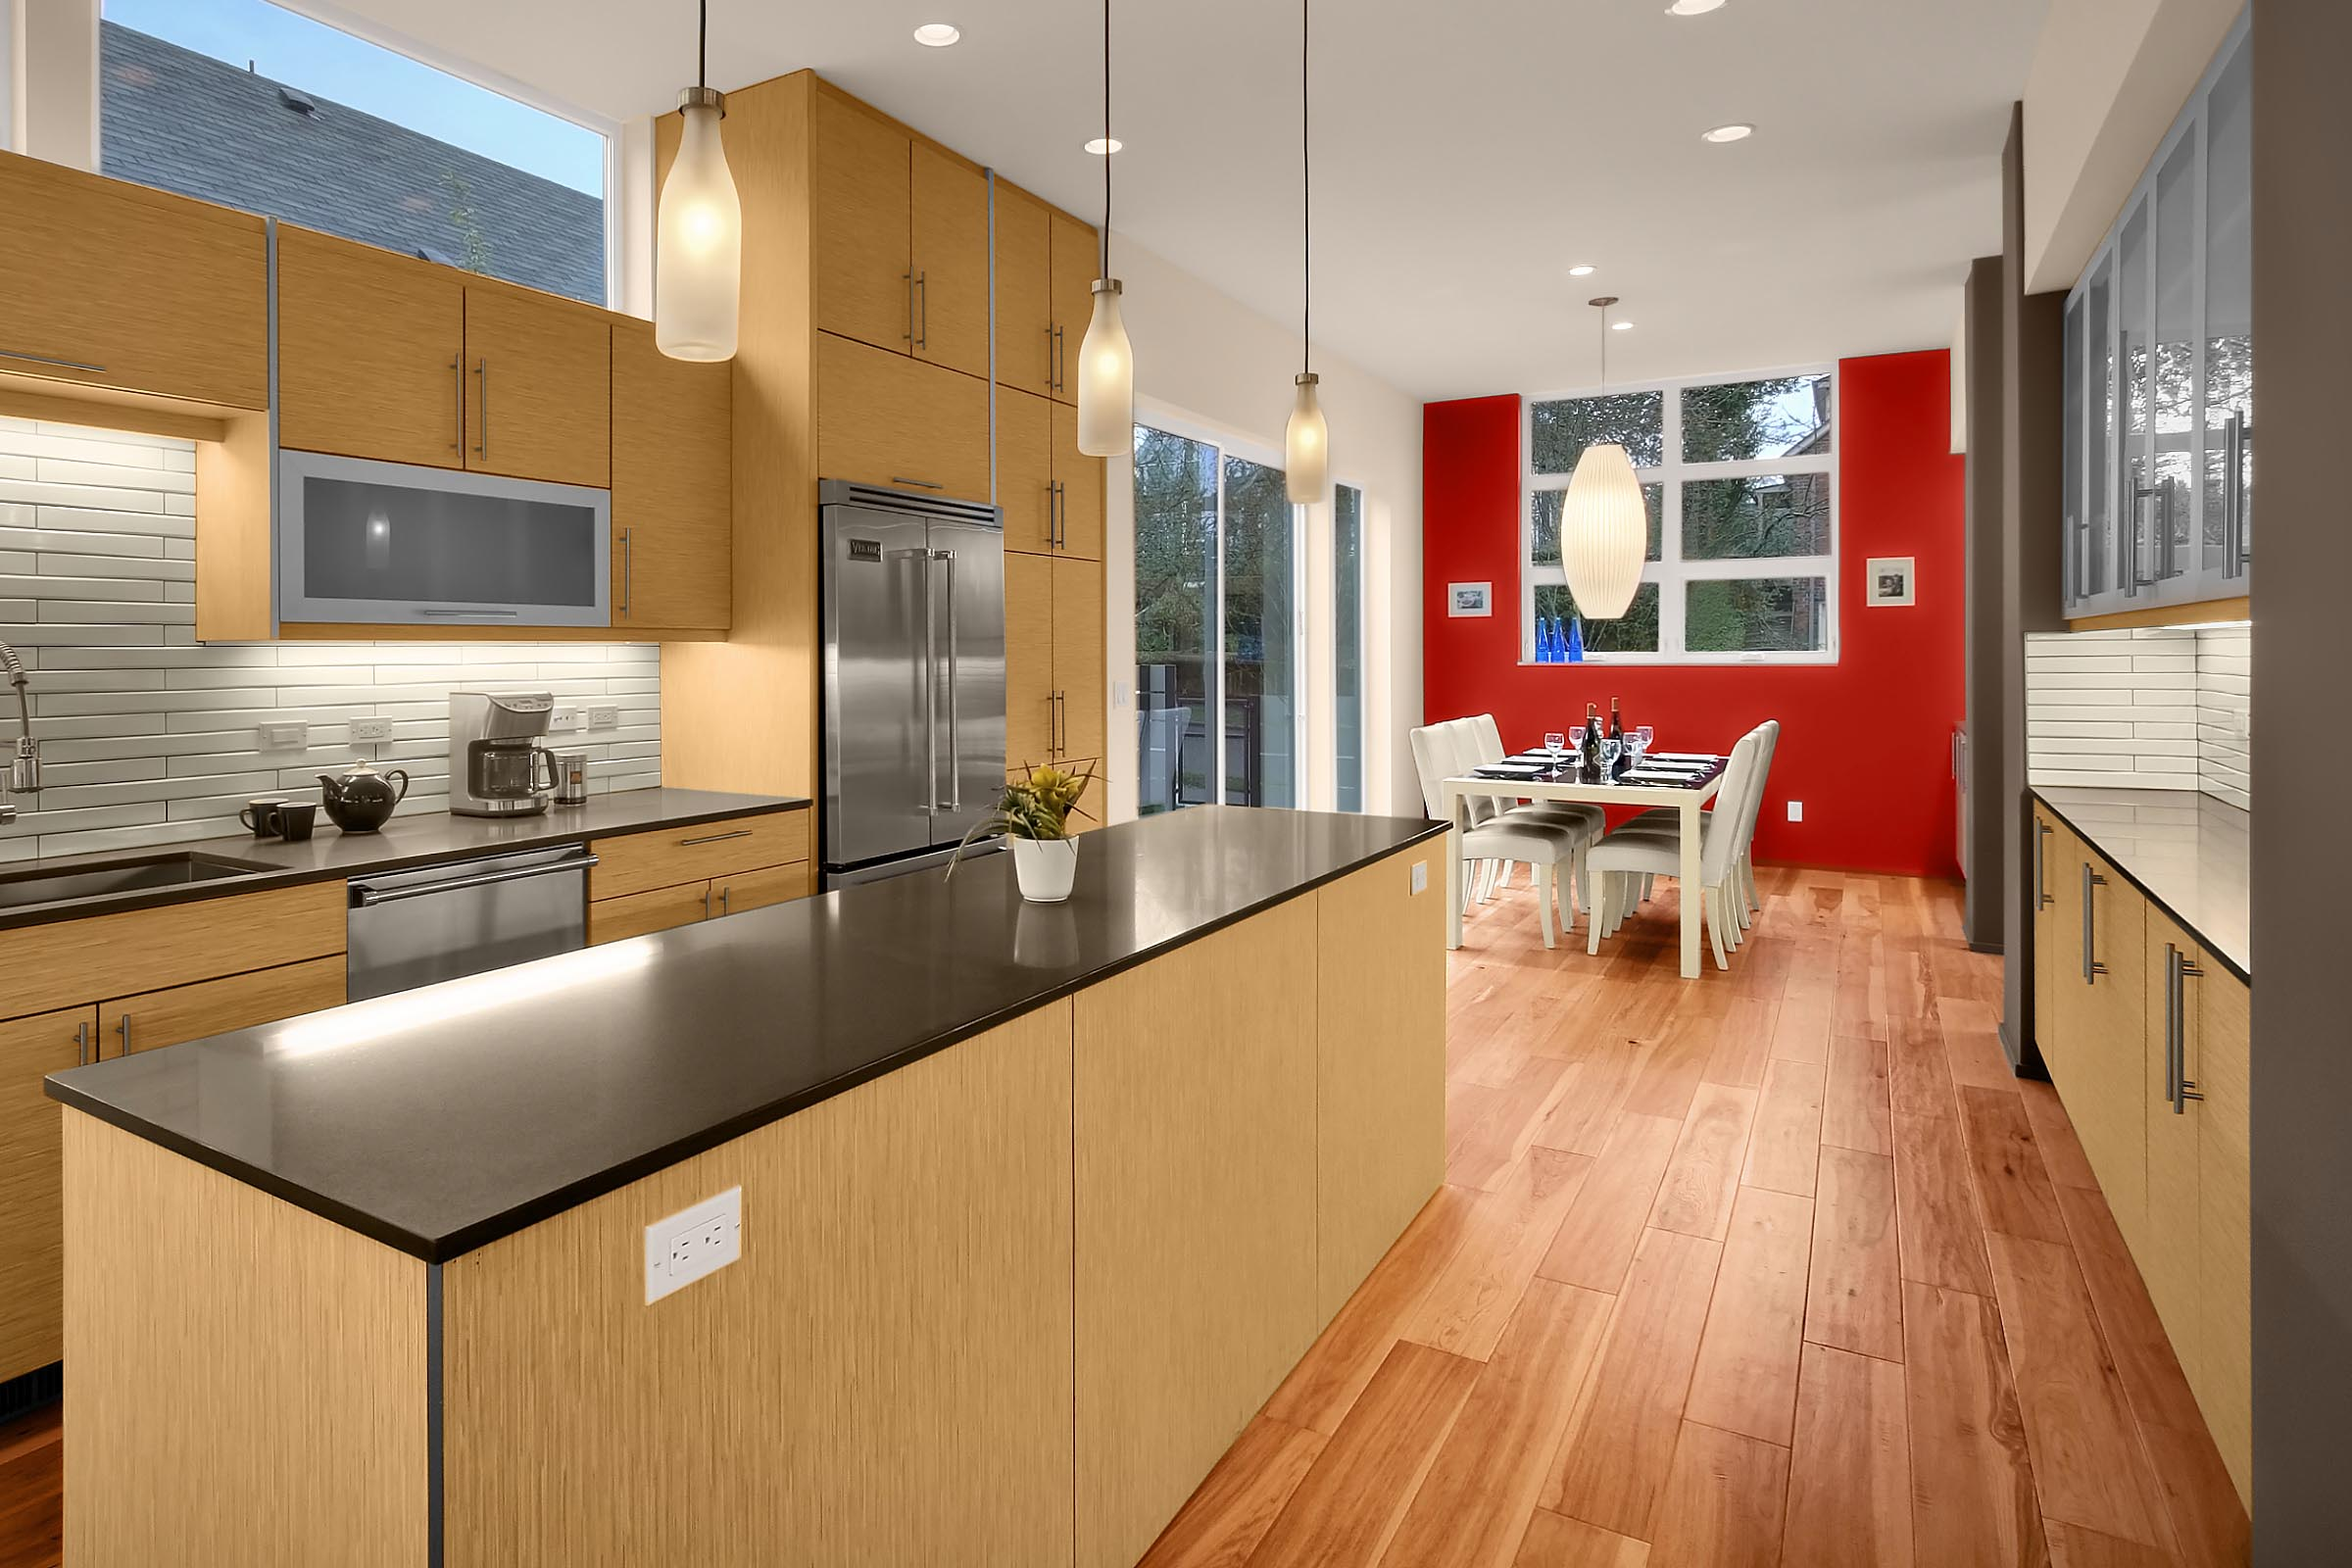 Kitchen Renovation NYC | Apartment & Bathroom Remodeling ...